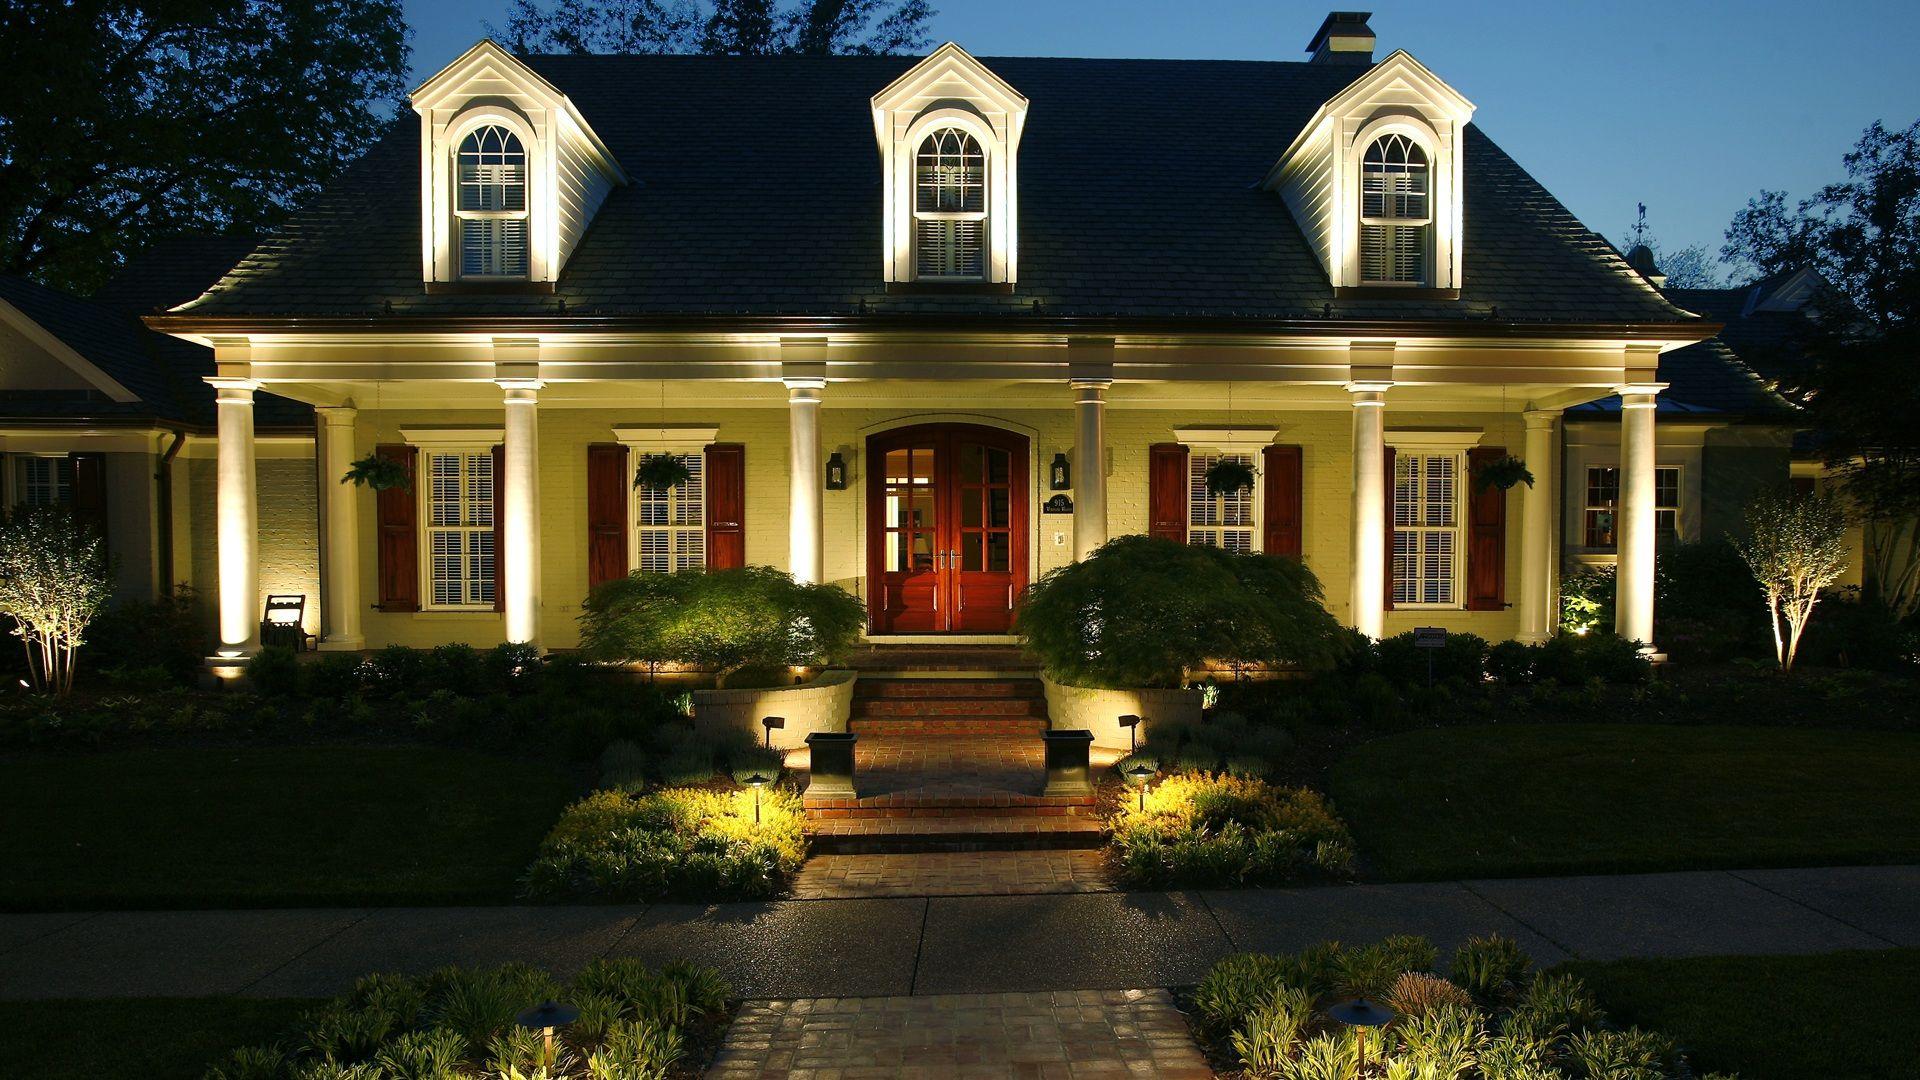 NiteLiters Professional Outdoor Landscape Lighting